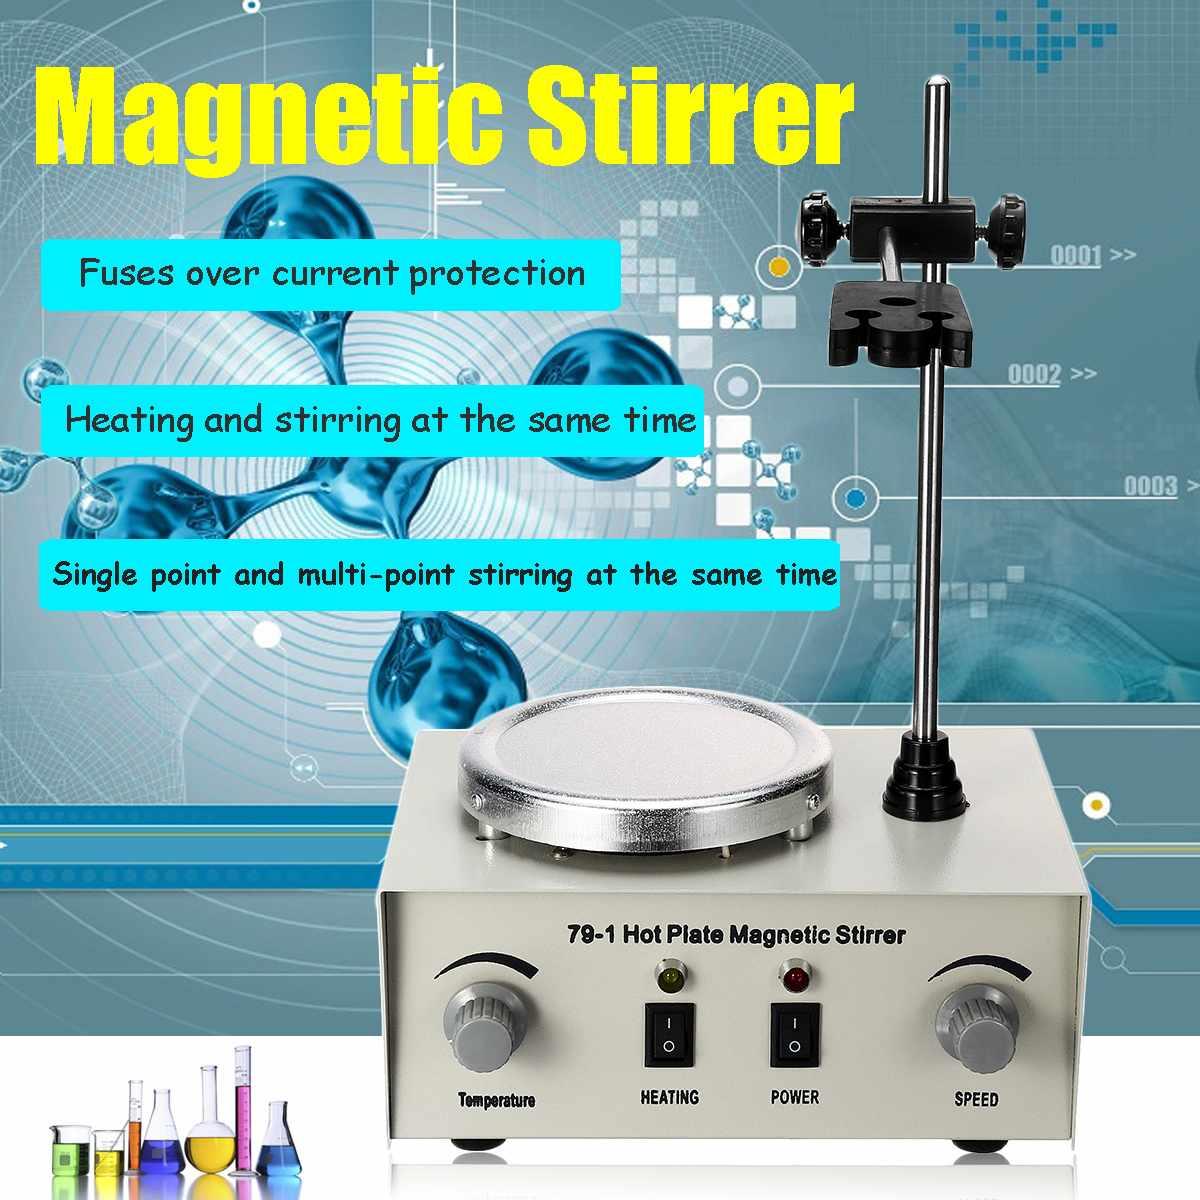 B Type 7PCS PTFE Magnetic Stirrer Mixer Stir Bar White Color Spinbar Stirring for Lab Use